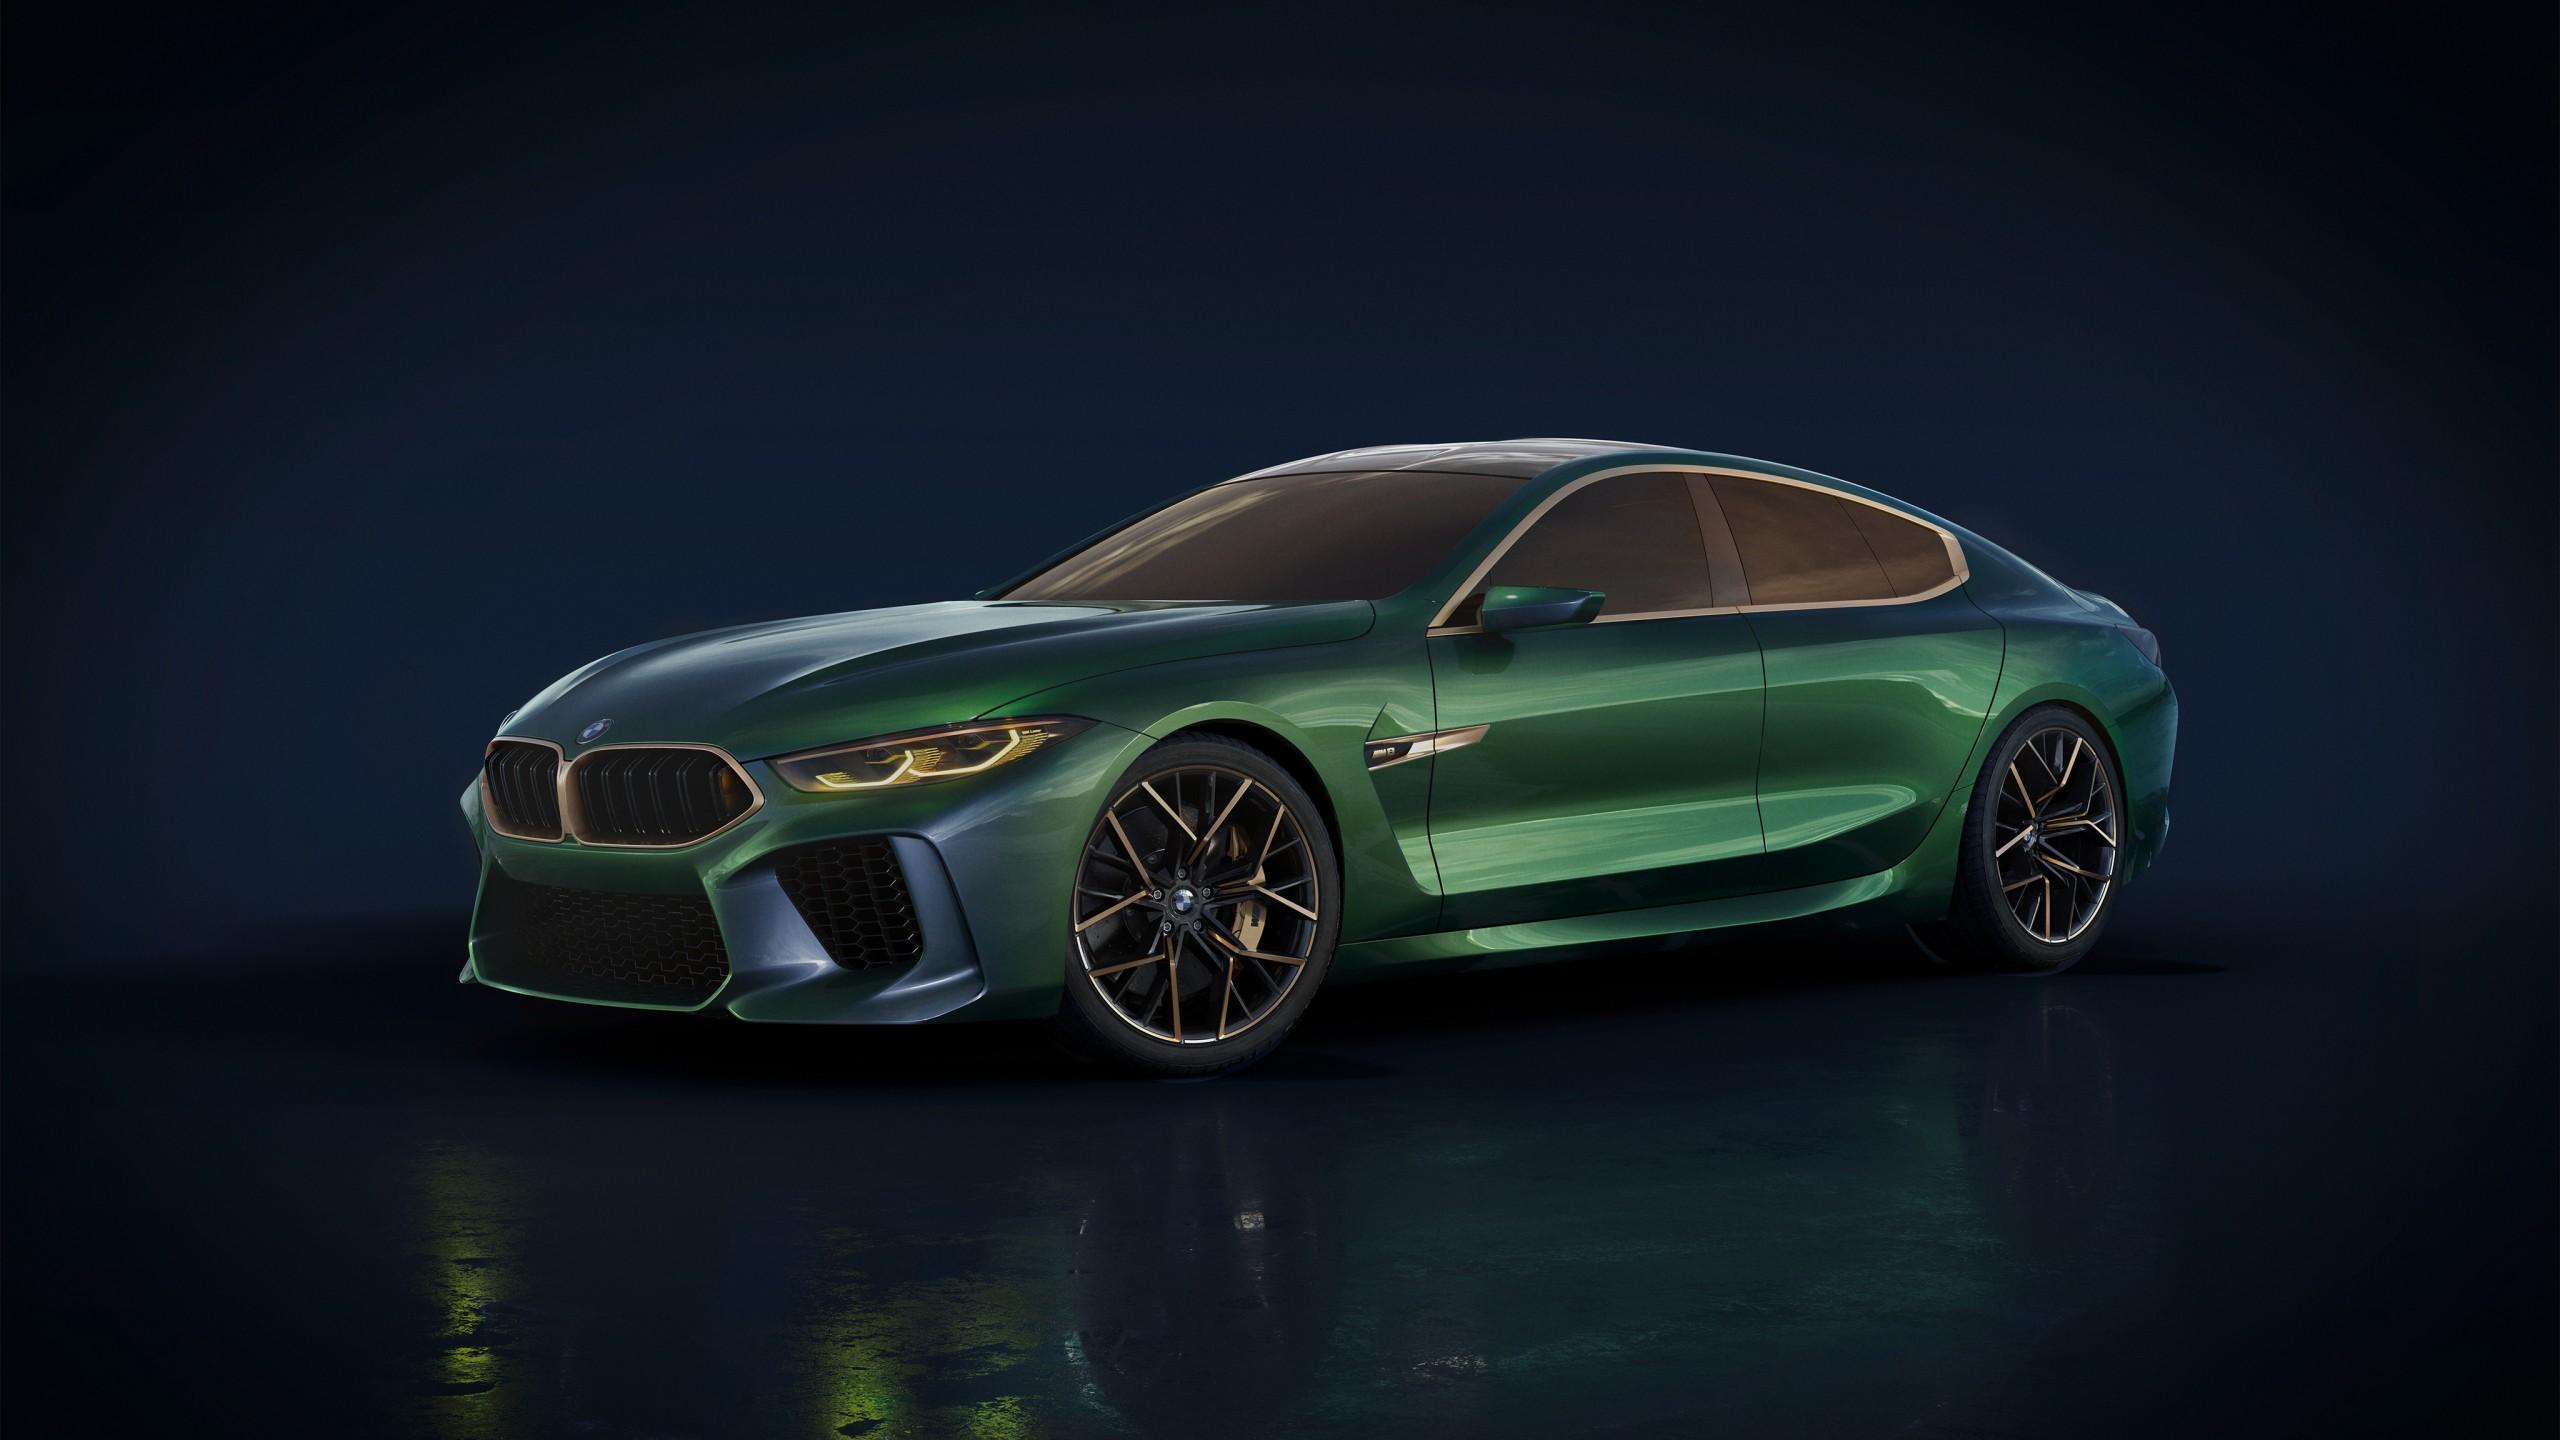 2018 BMW Concept M8 Gran Coupe 4K 3 Wallpaper | HD Car ...